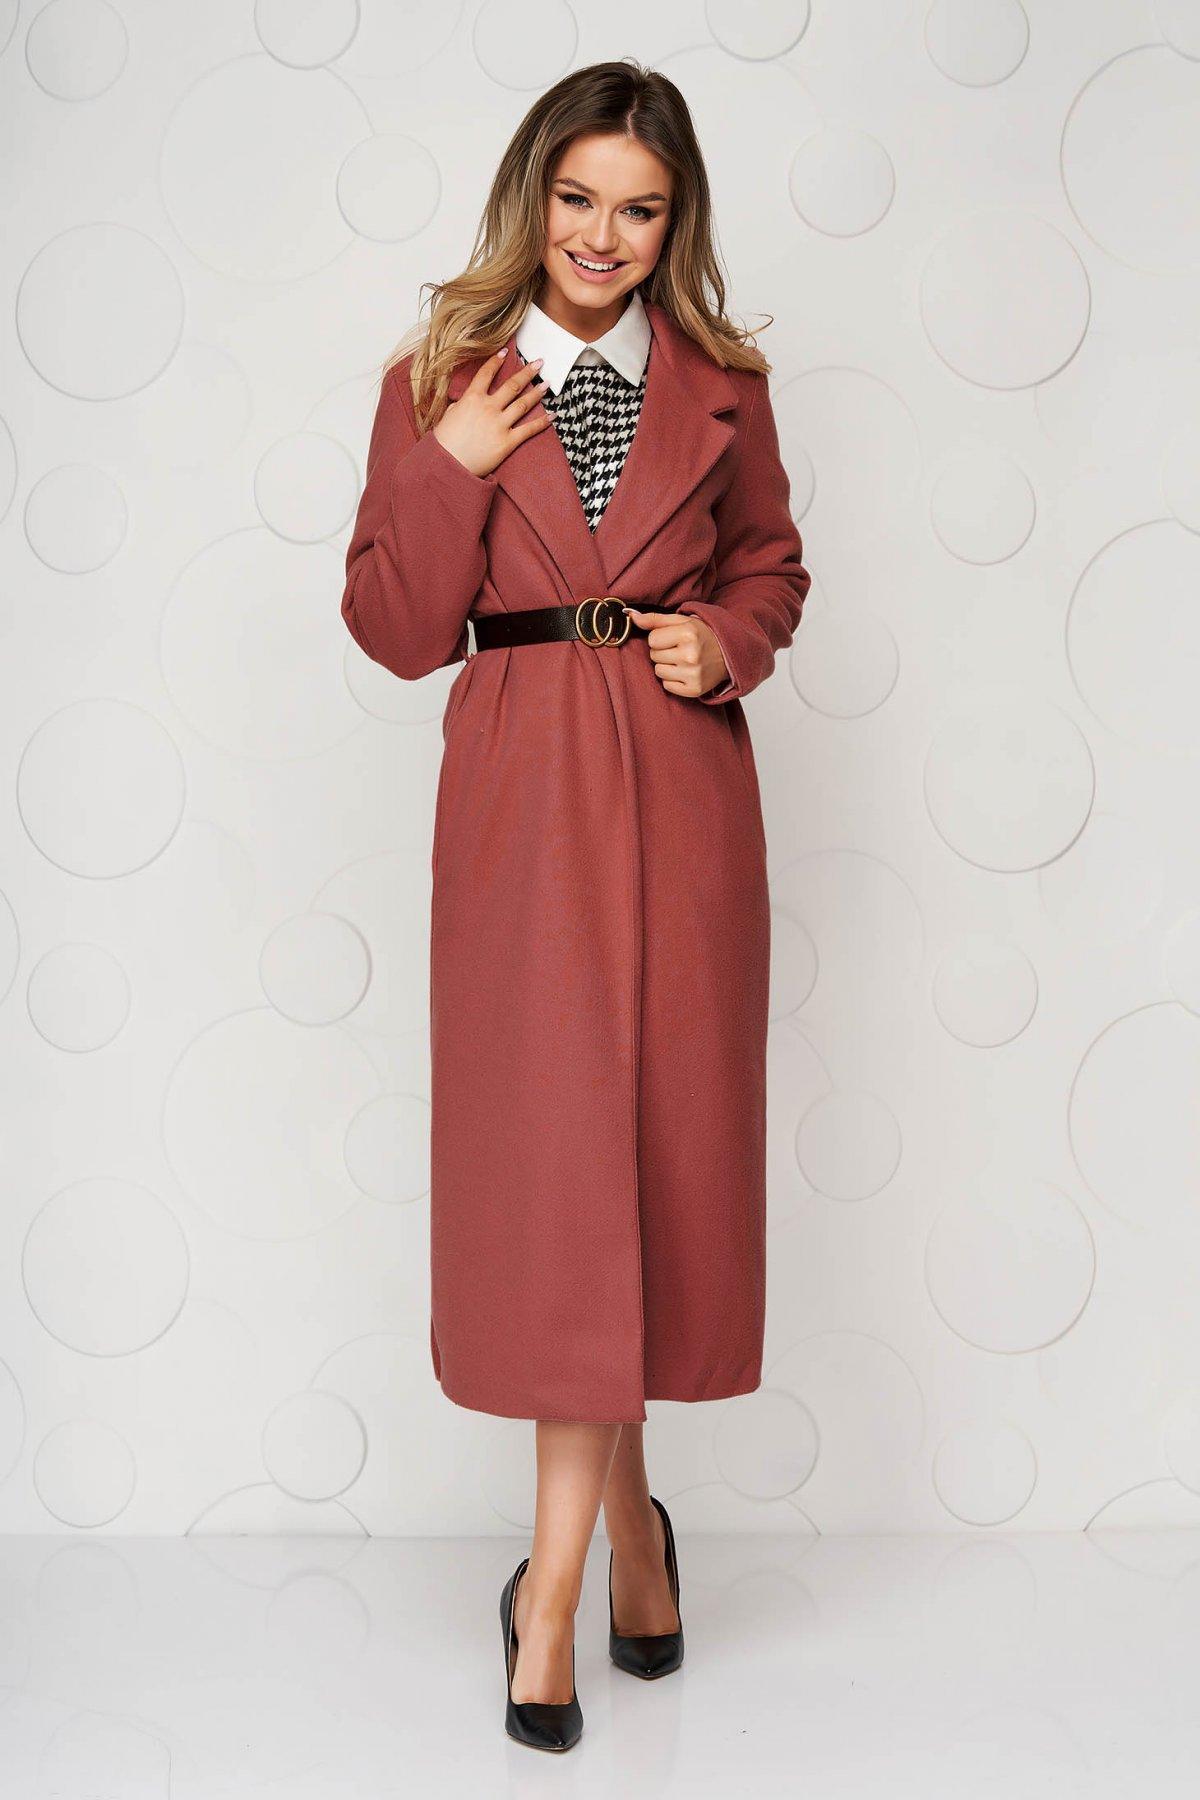 Palton SunShine caramiziu lung cu croi drept cu buzunare si curea